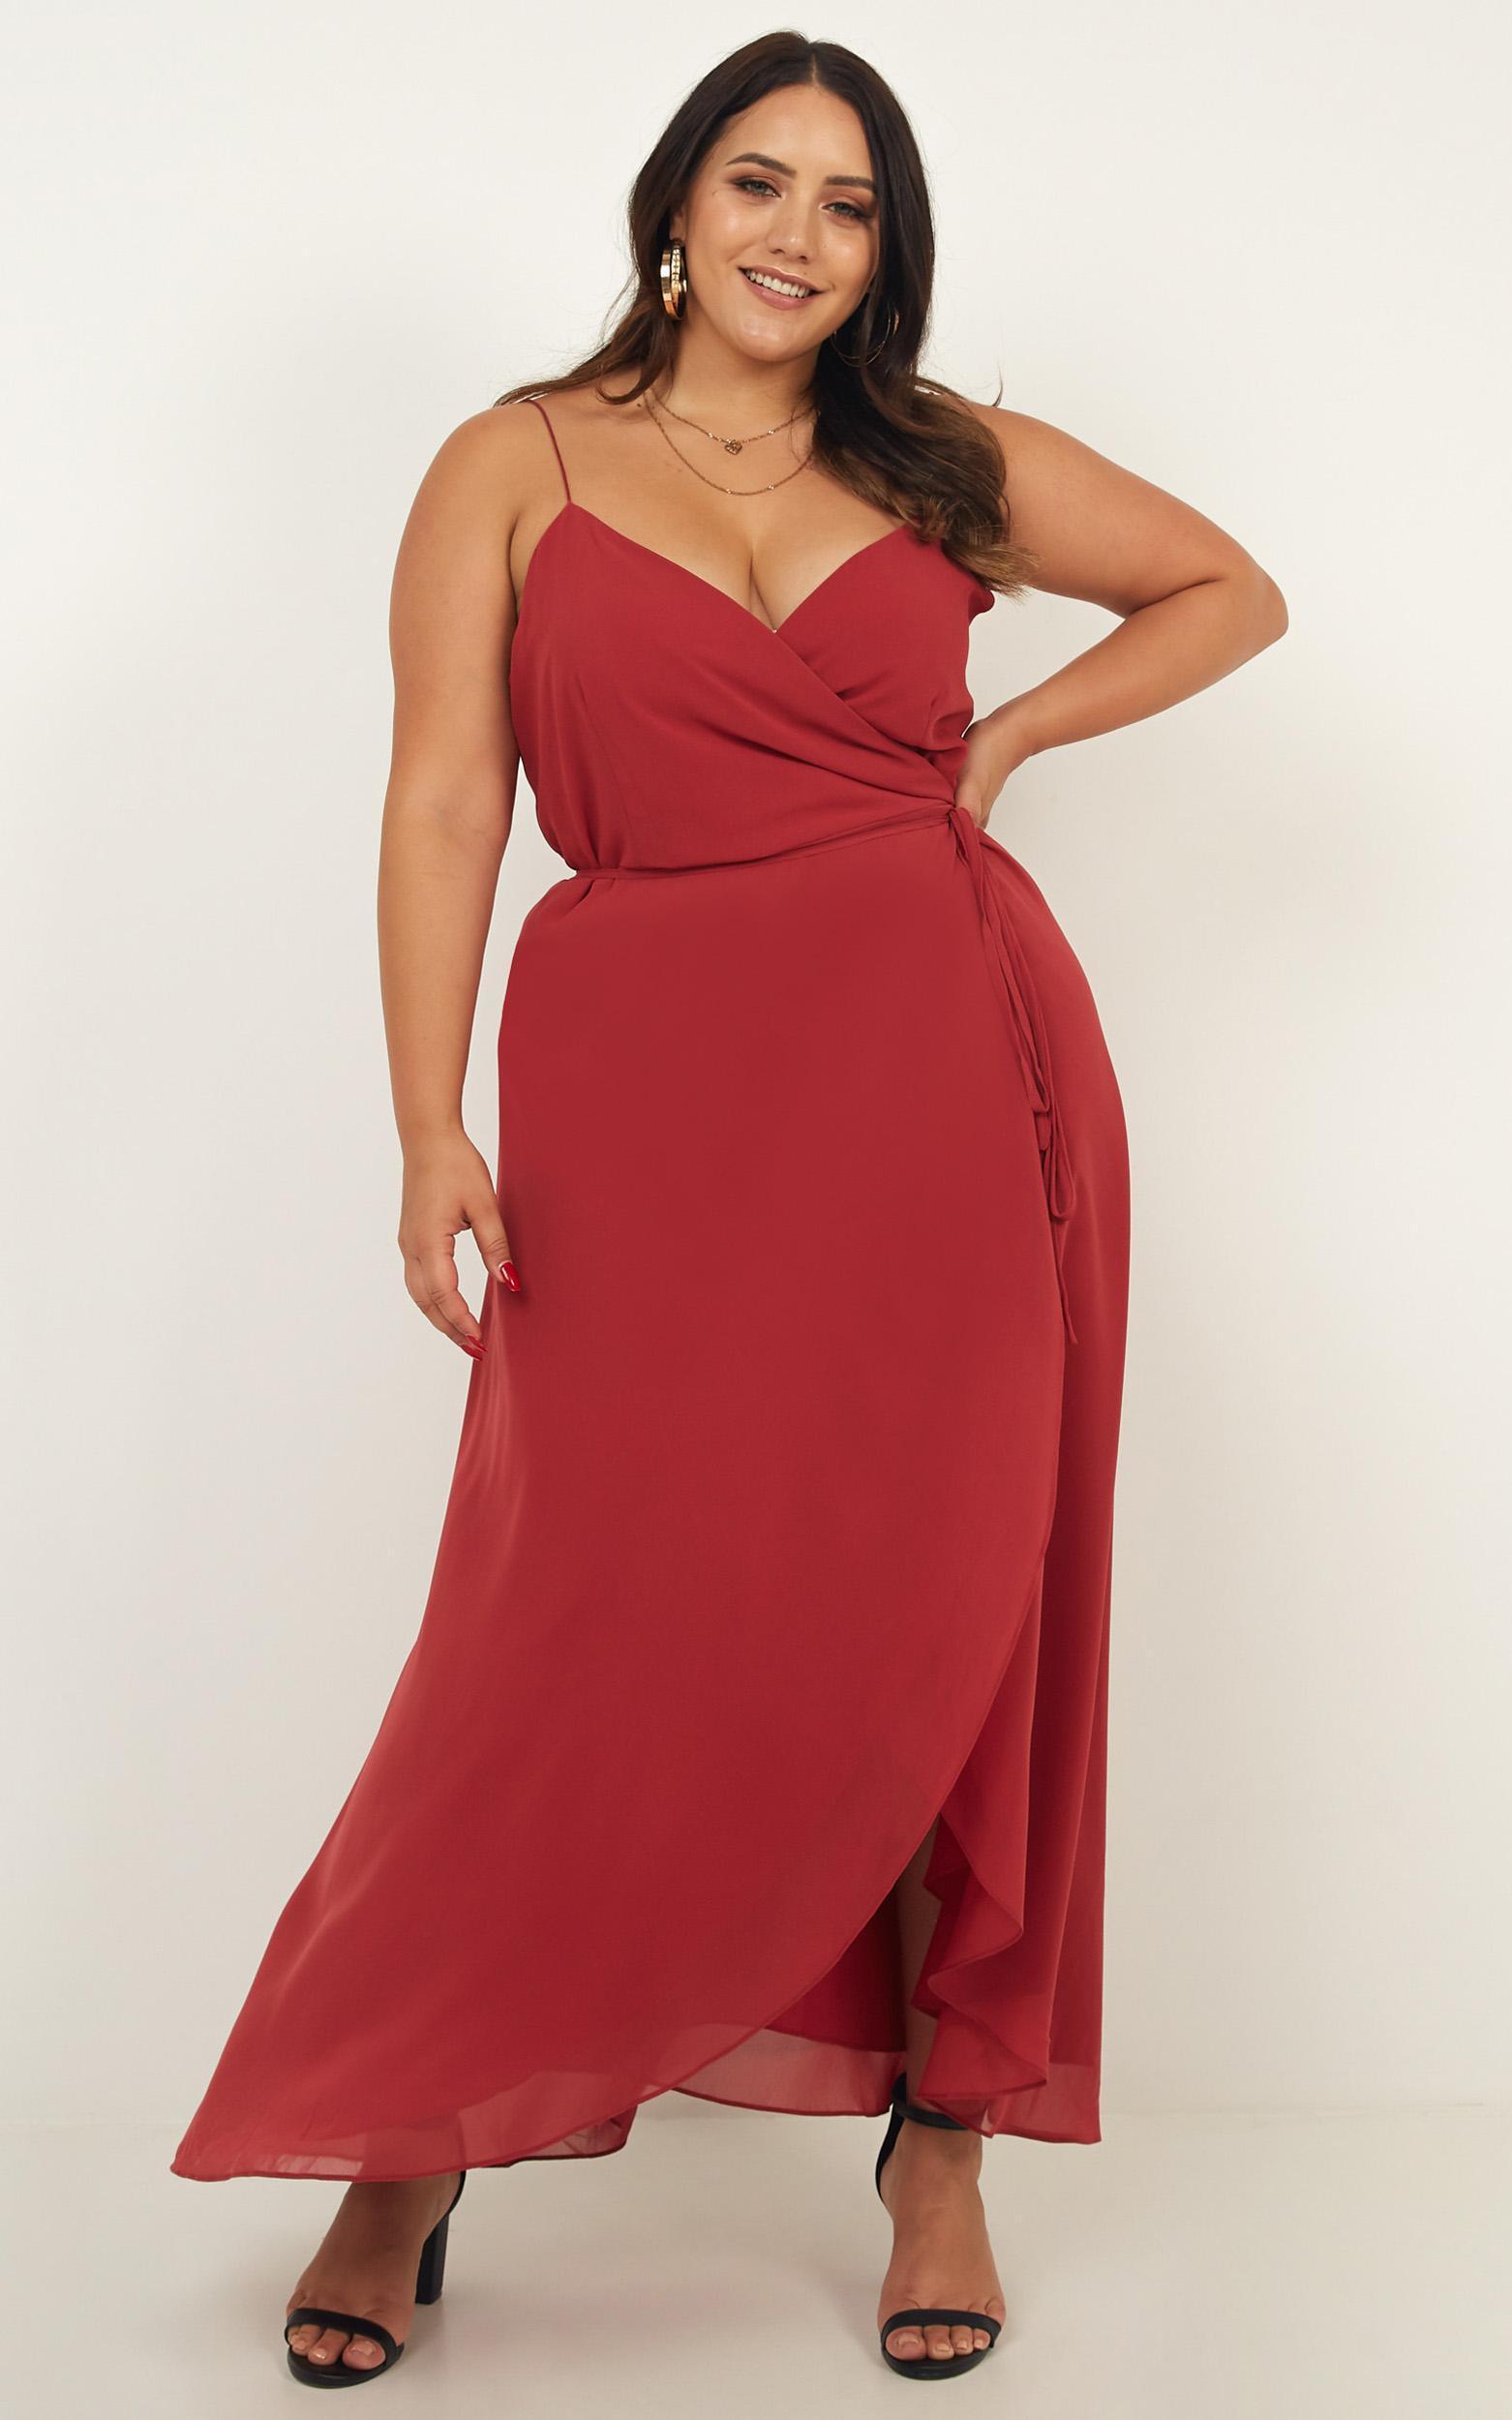 0682812273a Showpo - Red Comeback Season Dress - Lyst. View fullscreen